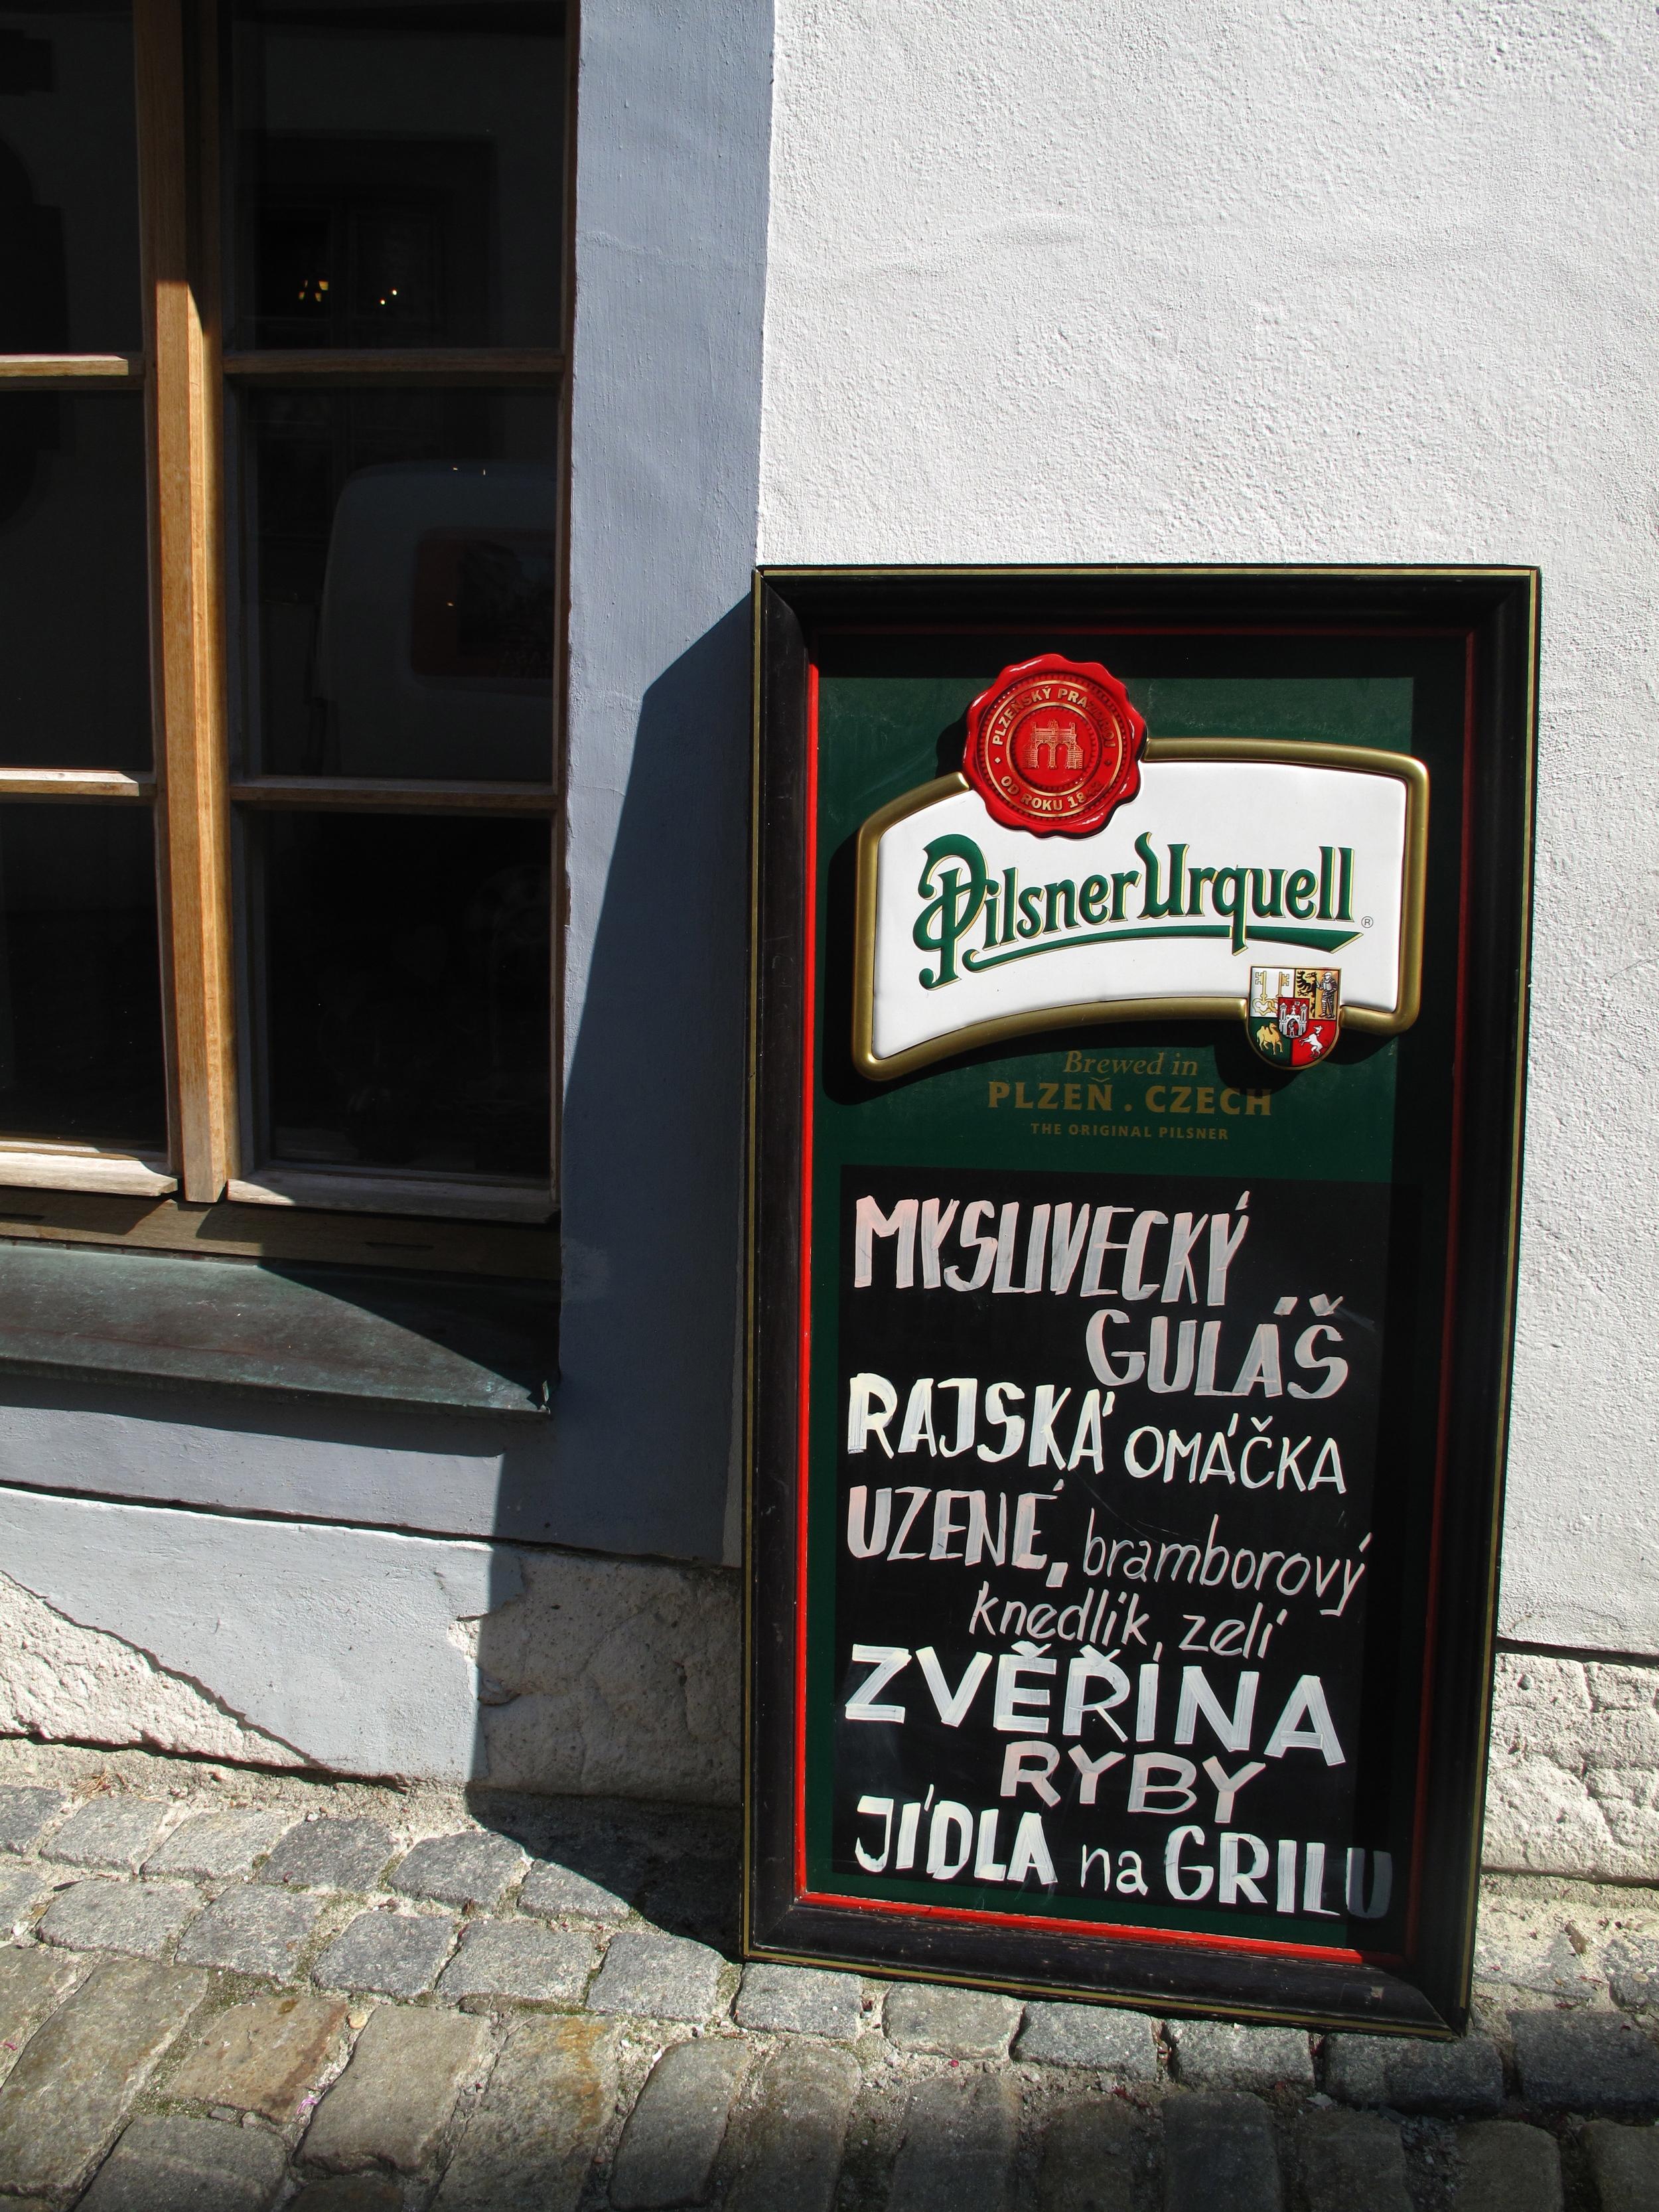 Pilsner Urquell pub sign in Cesky Krumlov, Czech Republic